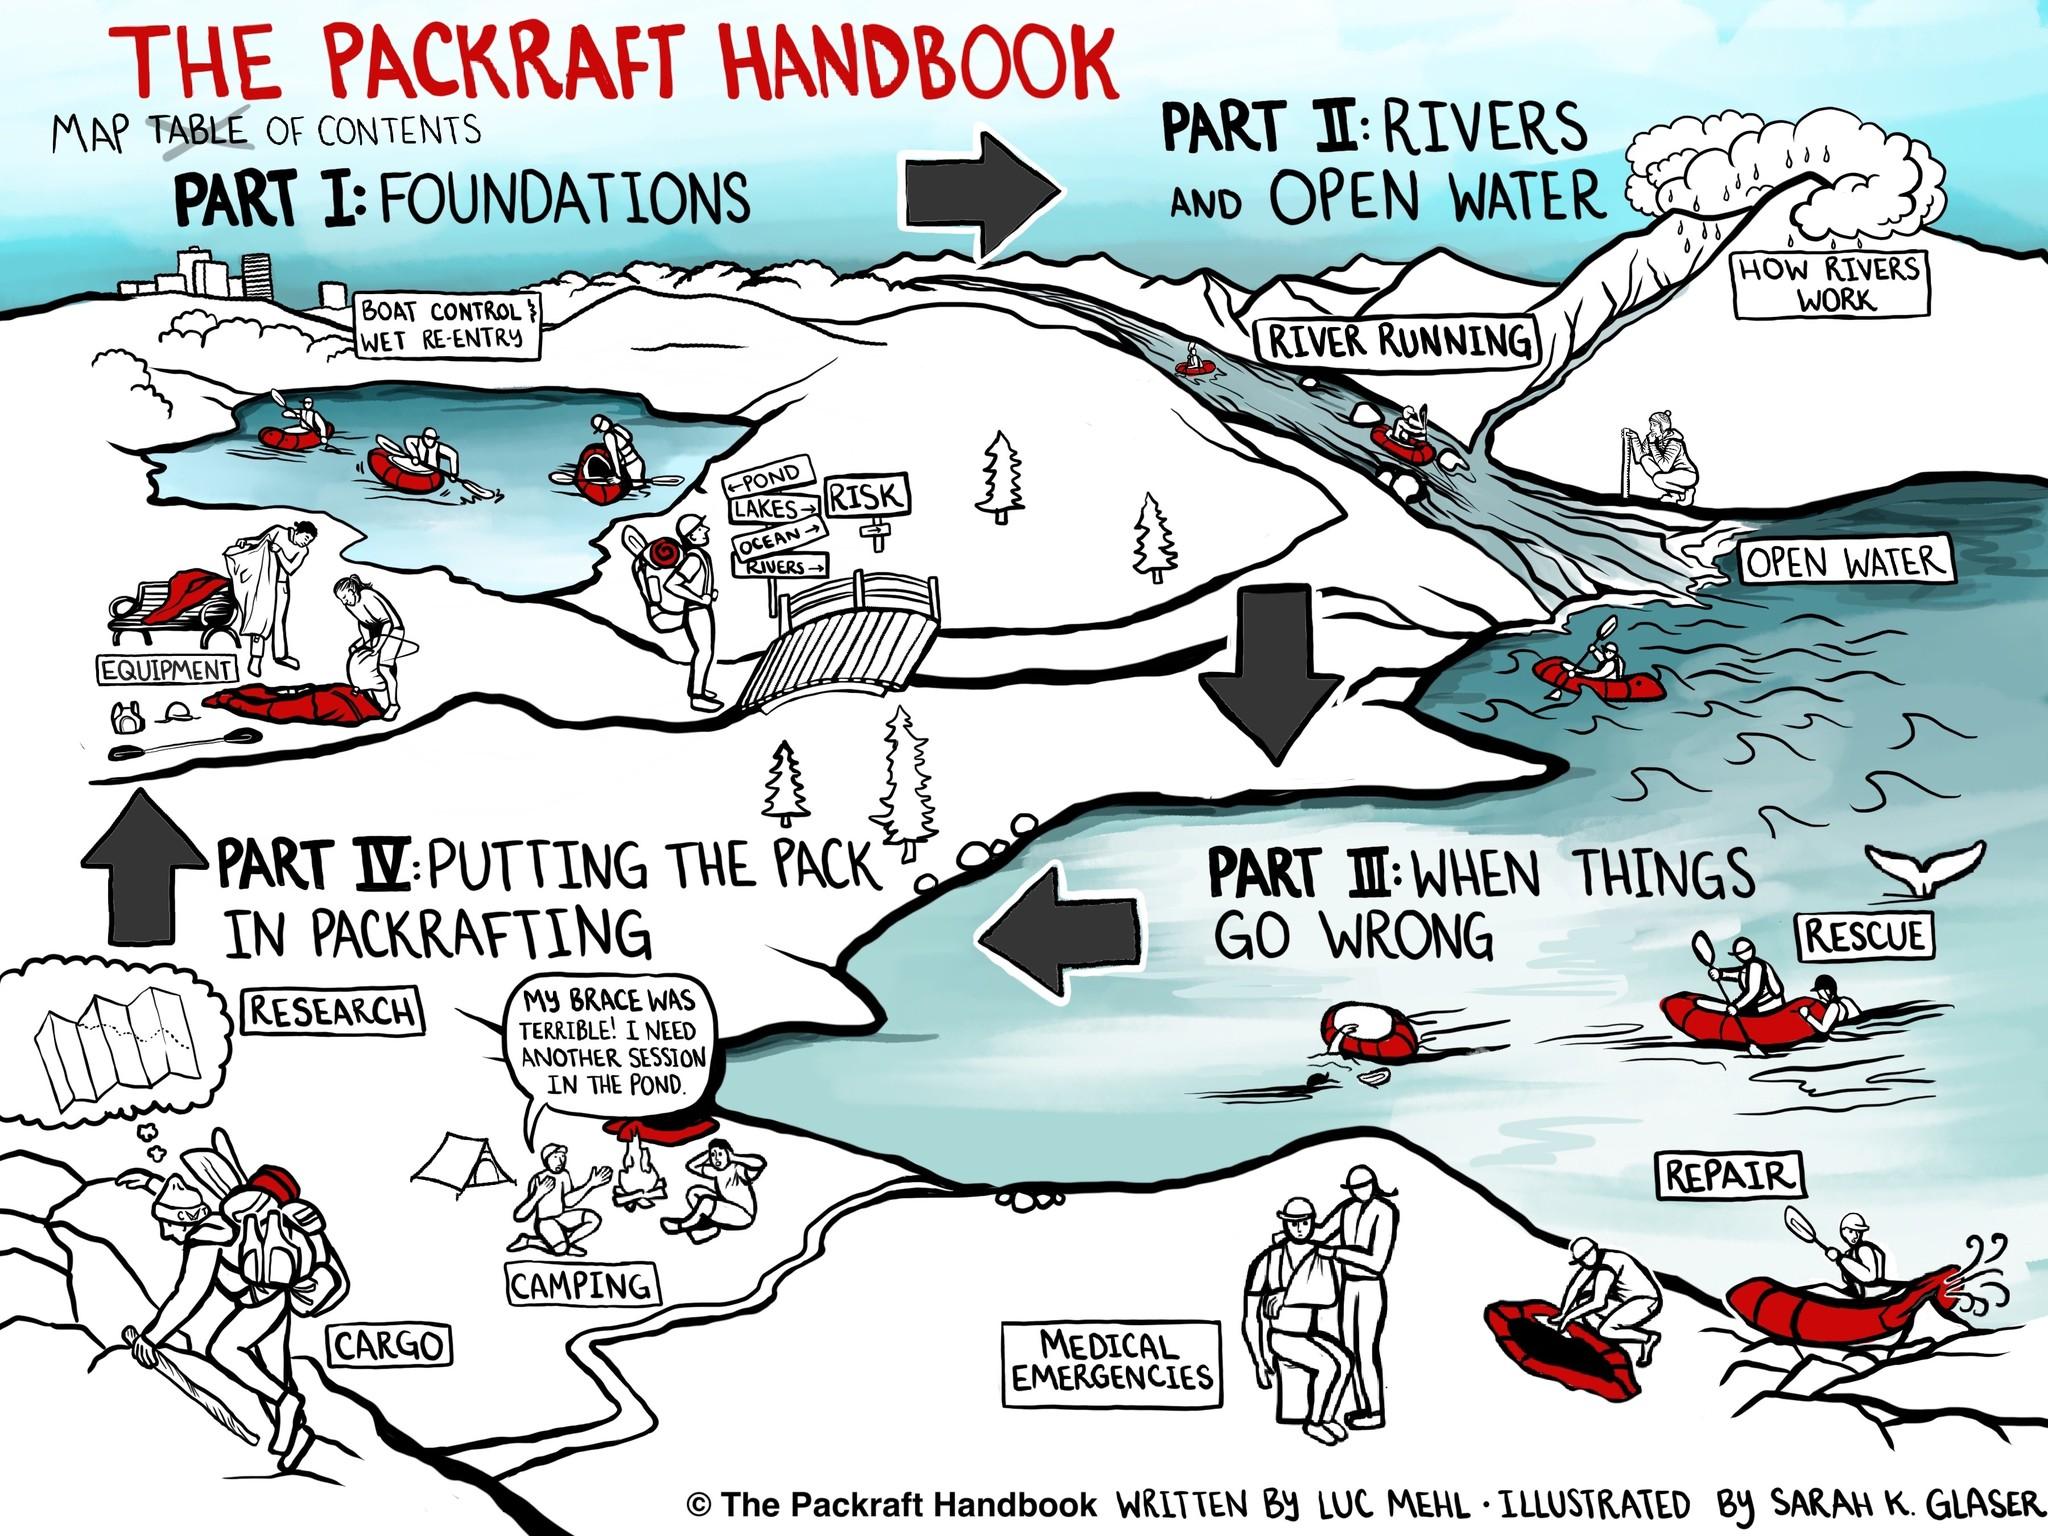 Packraft Handbook TOC